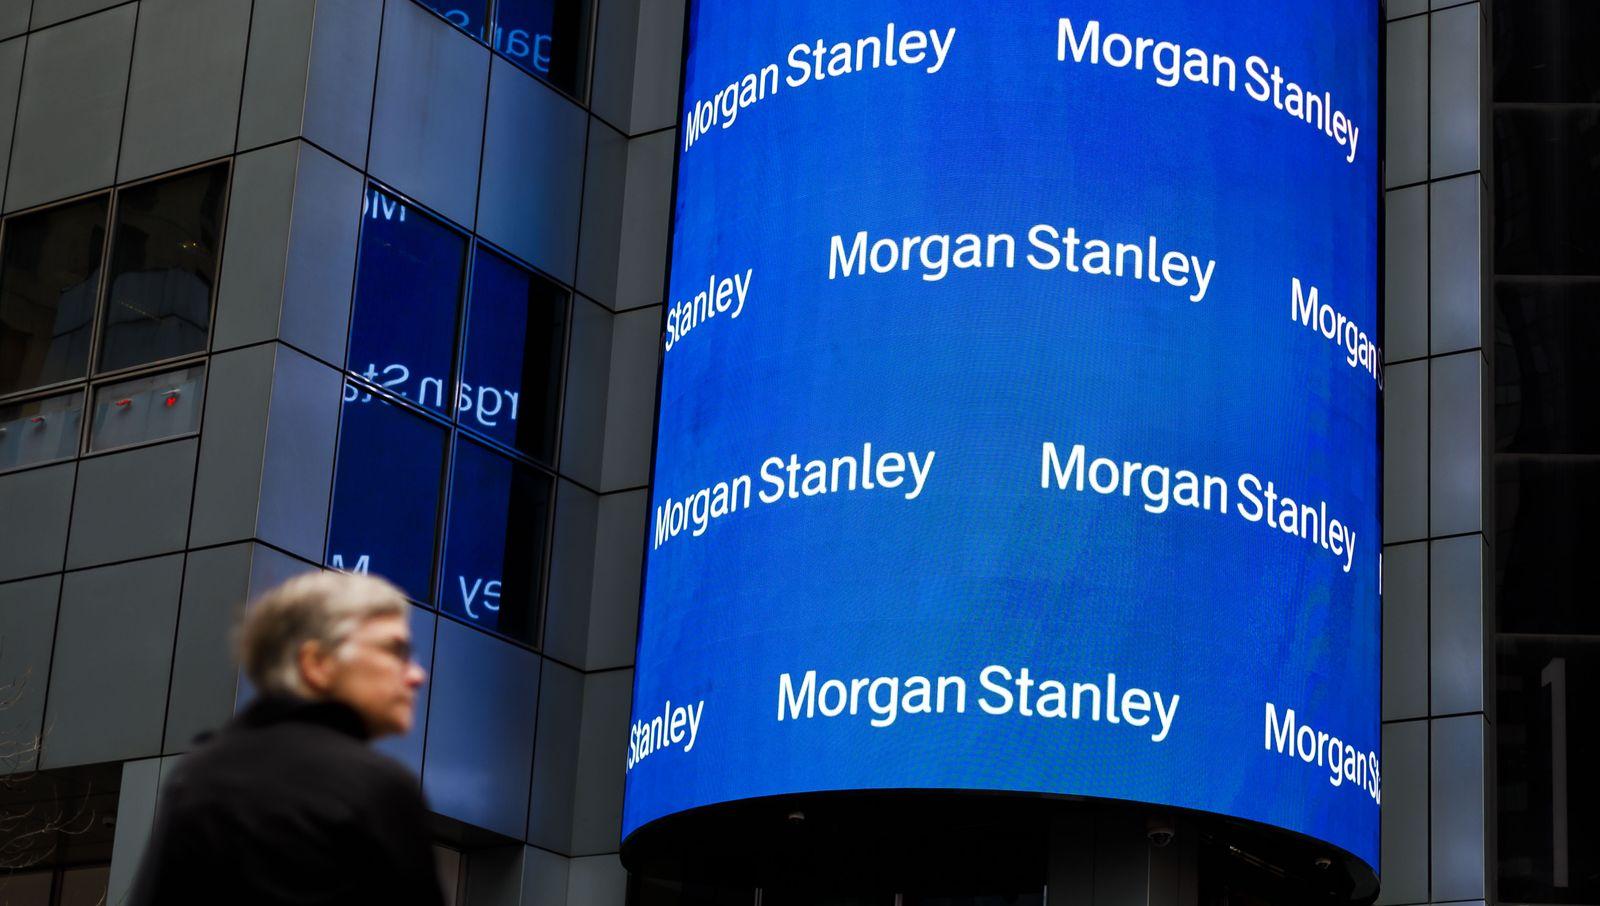 Morgan Stanley results, New York, USA - 20 Feb 2020